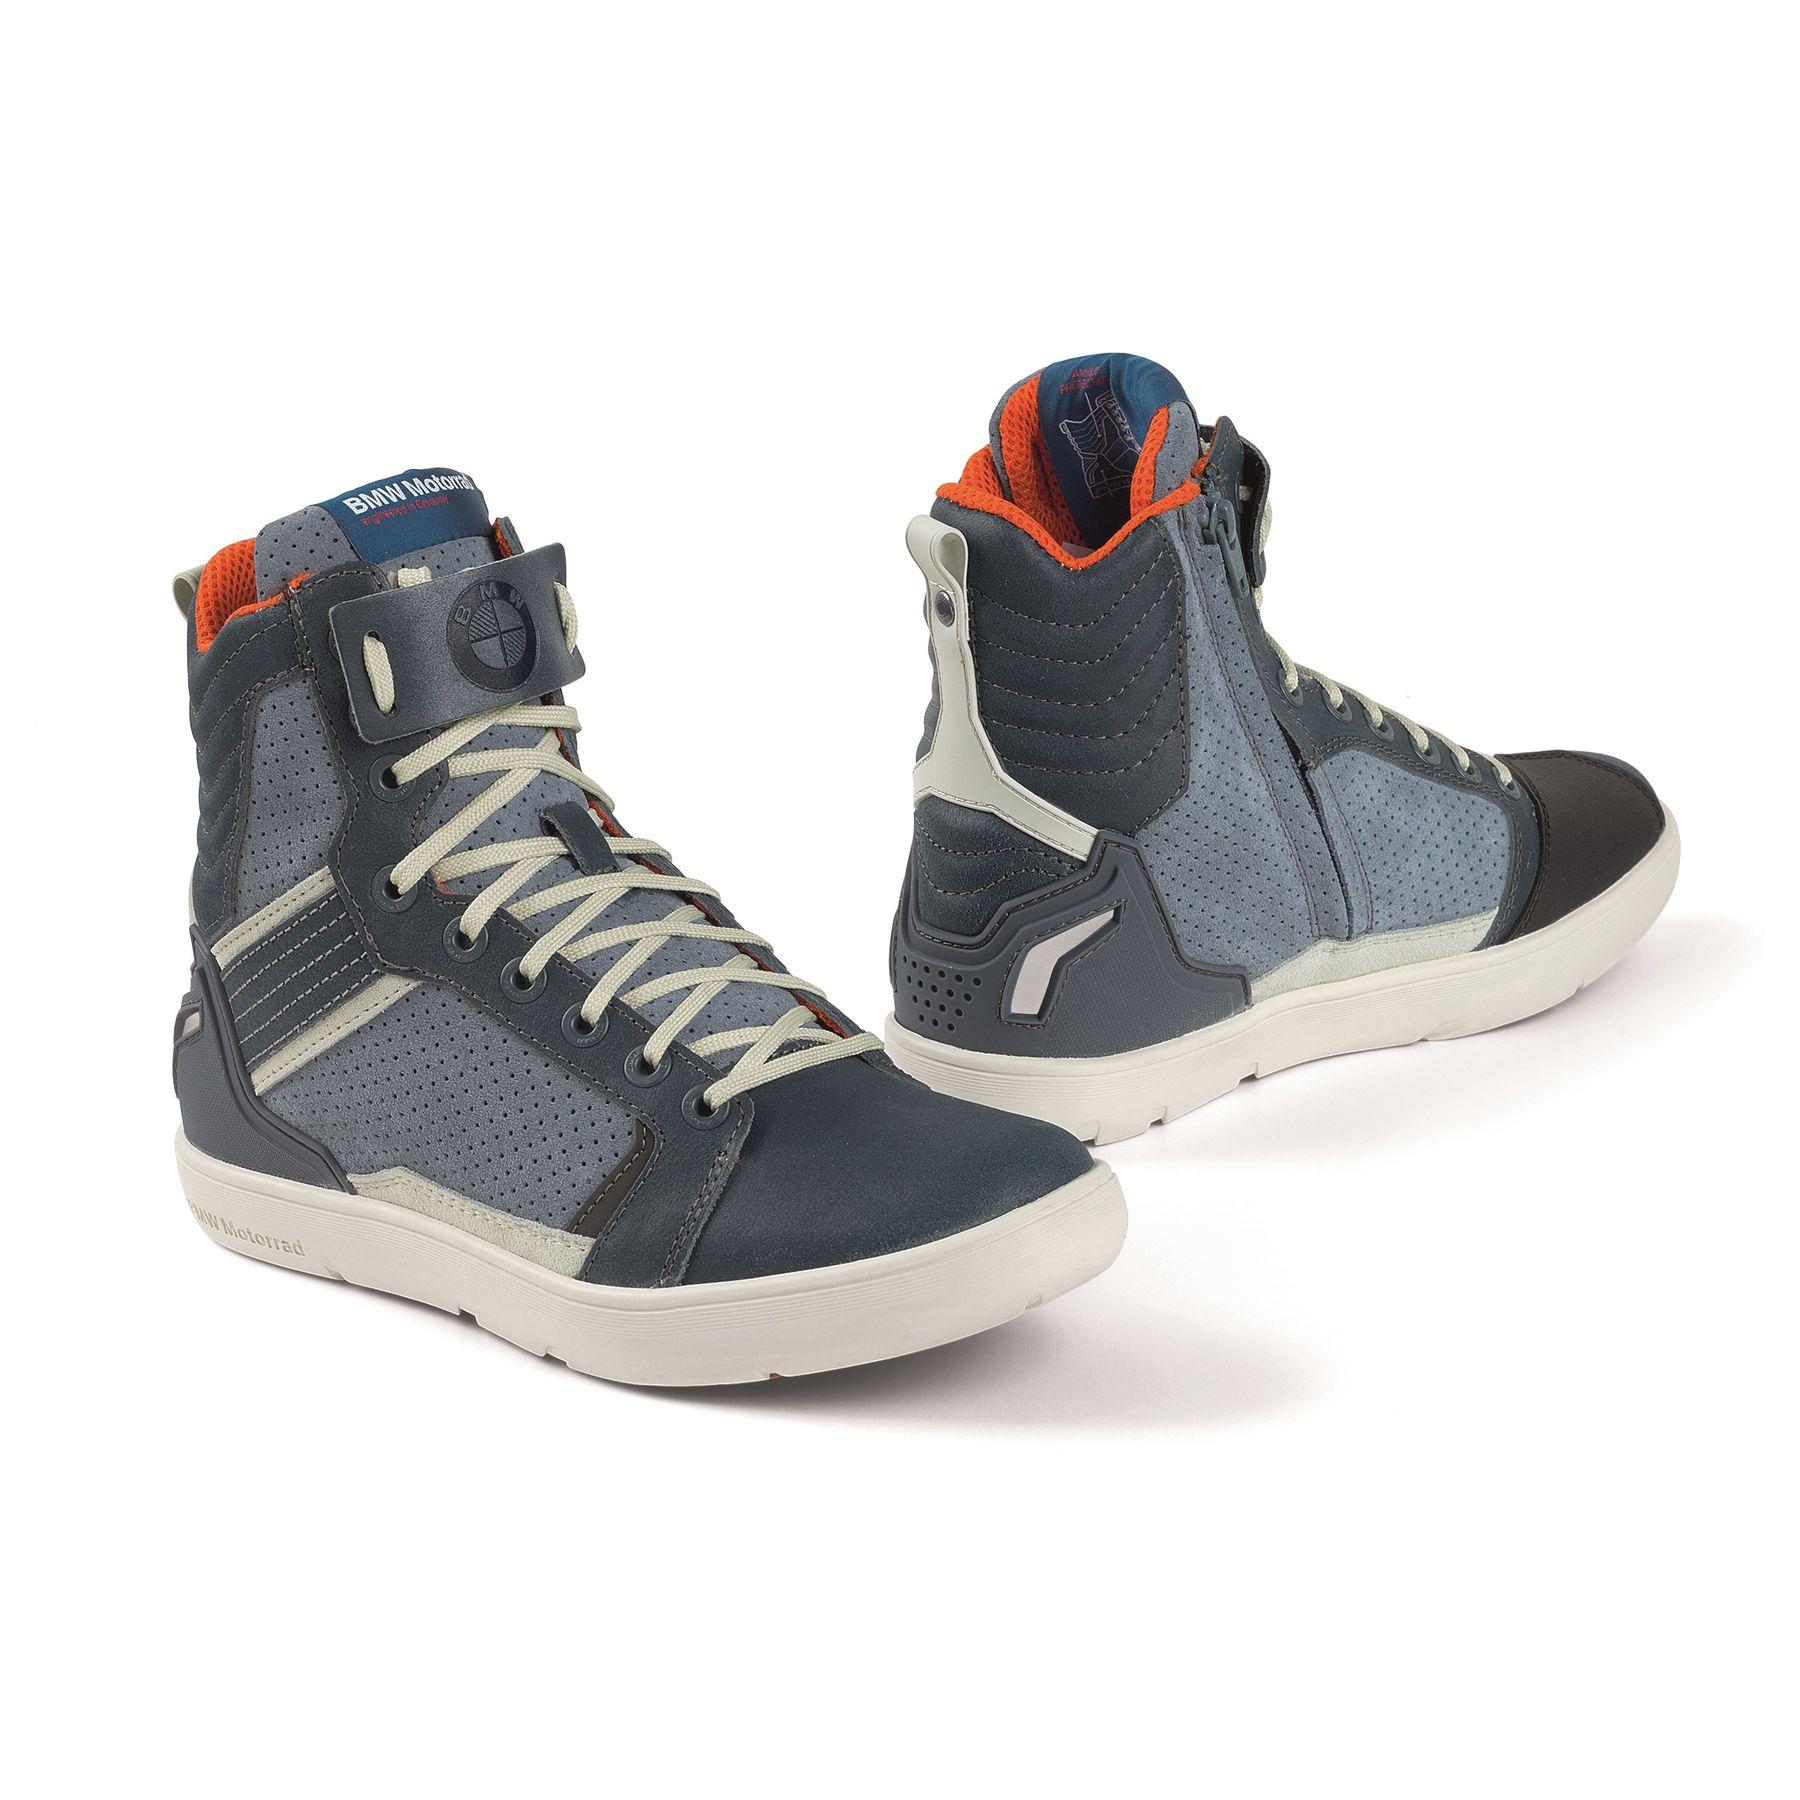 BMW Ride Sneakers - RevZilla